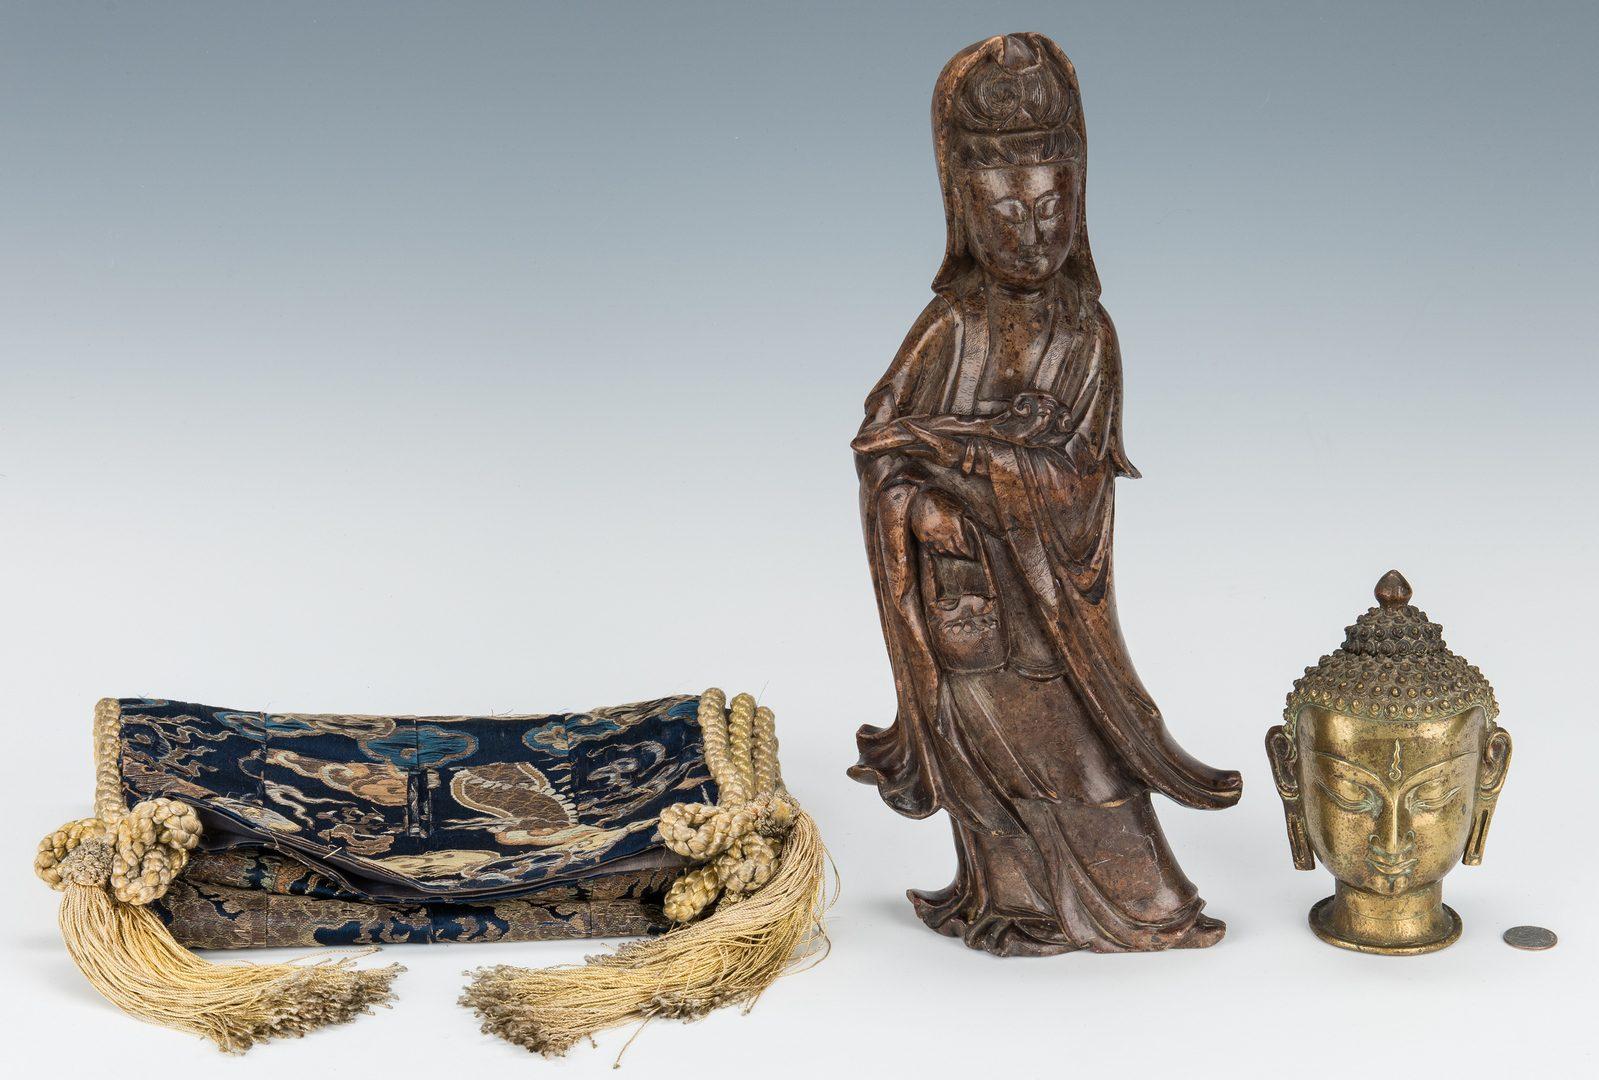 Lot 215: 4 Asian Decorative Items, incl. Sculptures